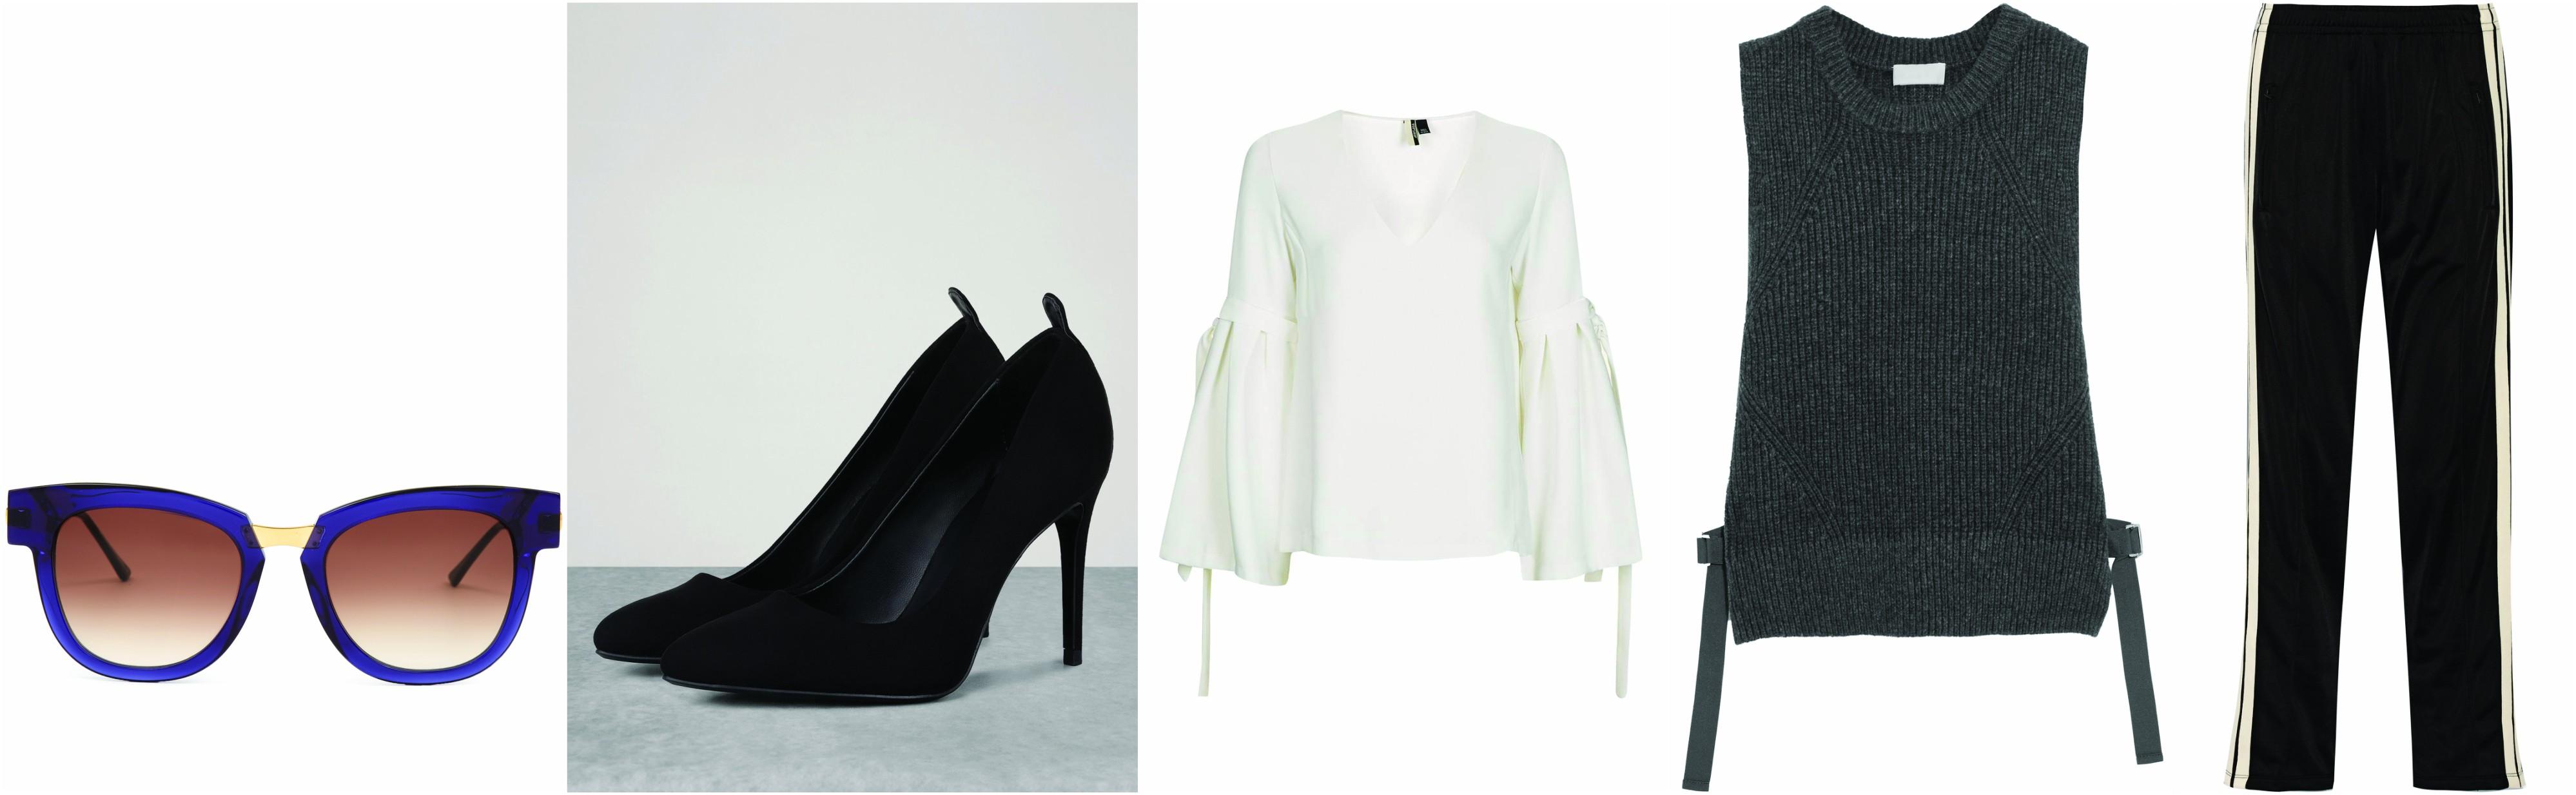 Sunglasses: Thierry Lasry, Heels: Bershka, Blouse: Topshop, Pullover: DKNY, Pants: Etoile Isabel Marant